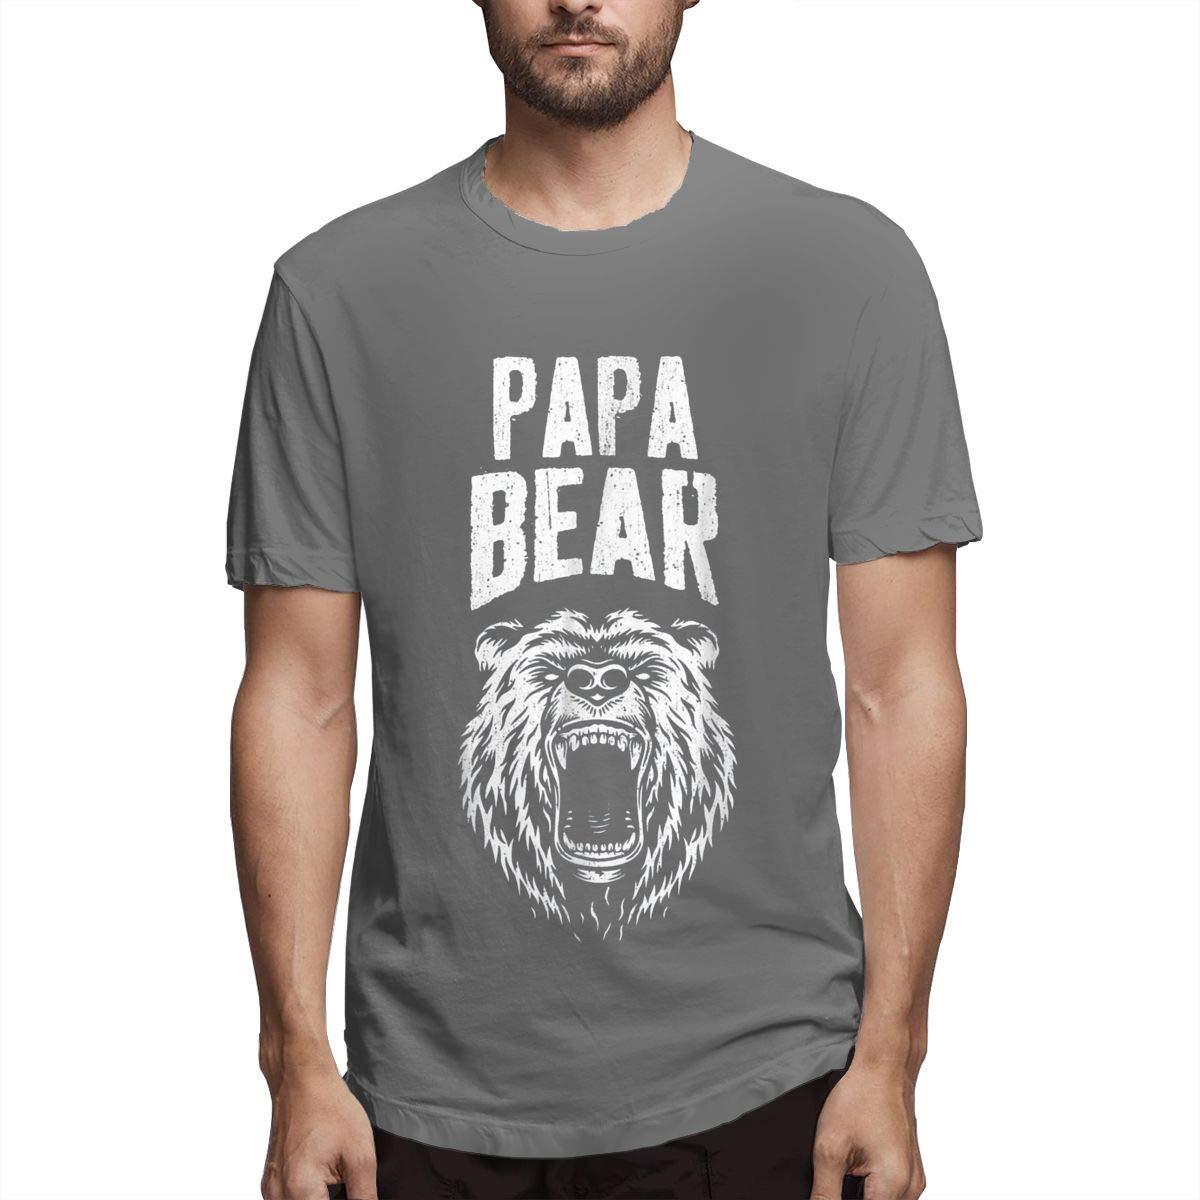 Jianju S Printed Sweaty Papa Bear Funny Father S Day Short Sleeve Fashion T Shirts Black